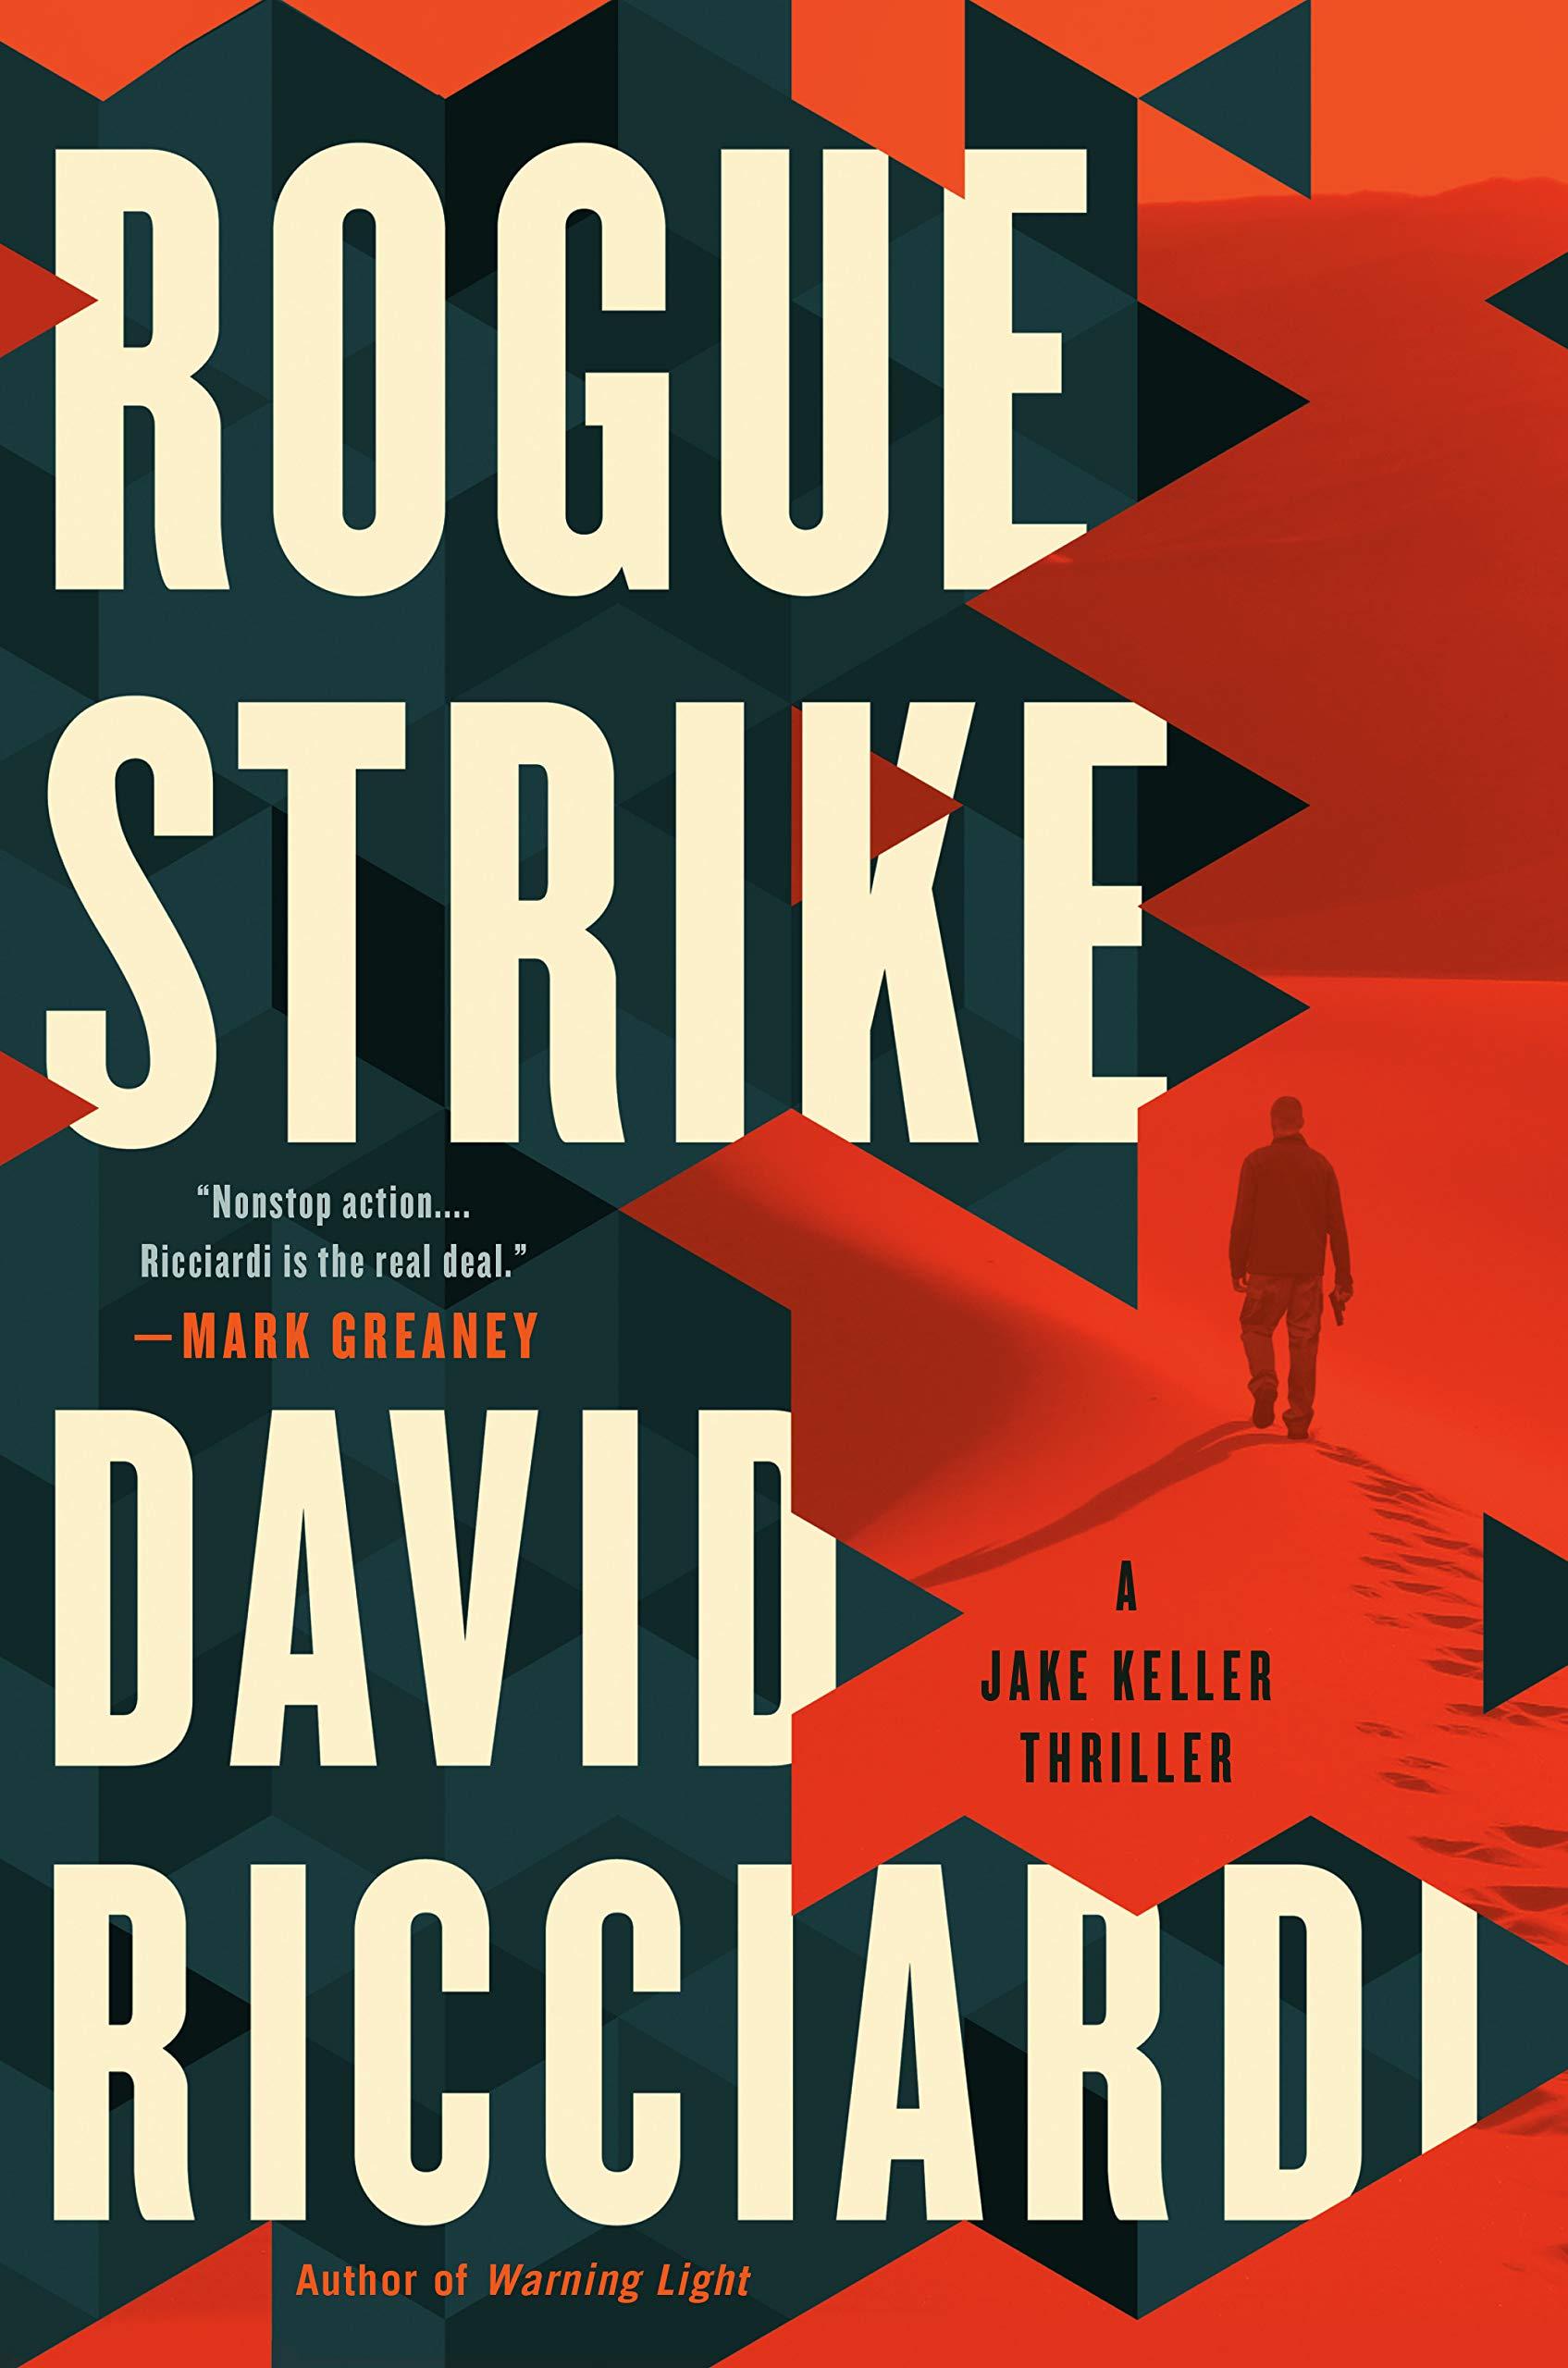 Rogue Strike (A Jake Keller Thriller Book 2)  David Ricciardi  Berkley Pub.  July 2nd, 2019